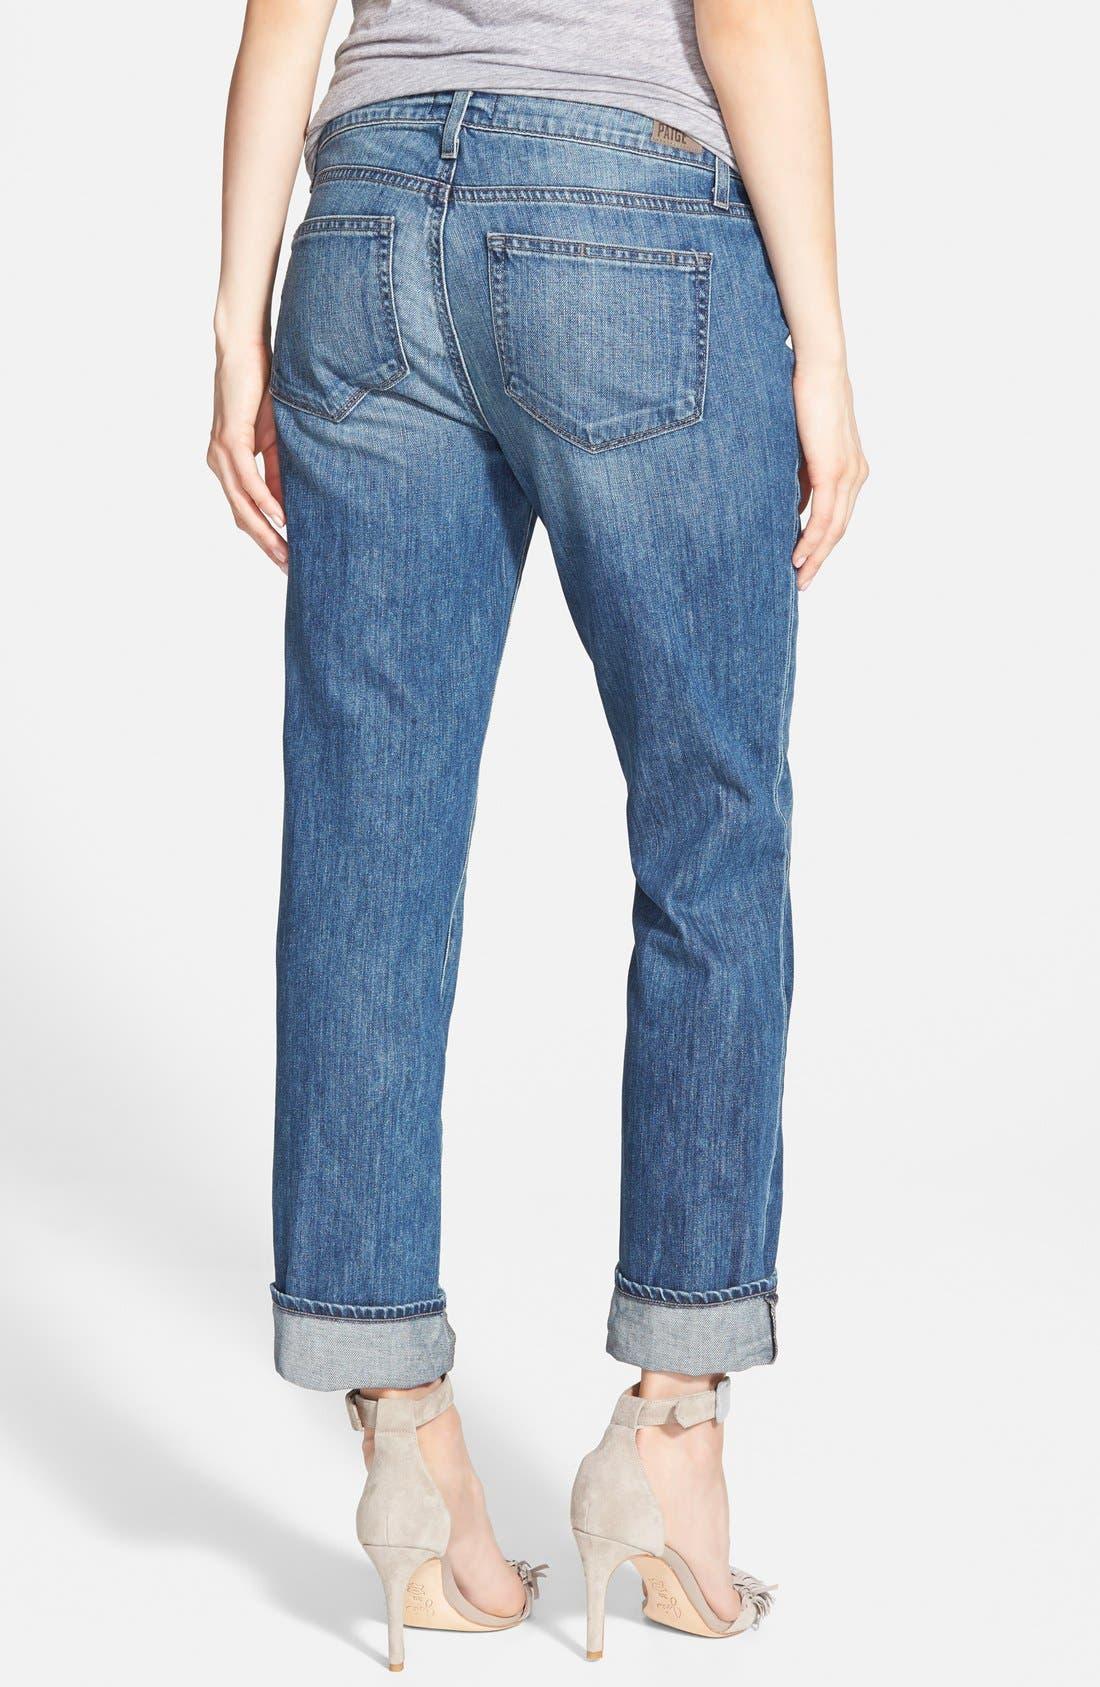 Alternate Image 2  - Paige Denim 'Porter' Boyfriend Jeans (Dazely)